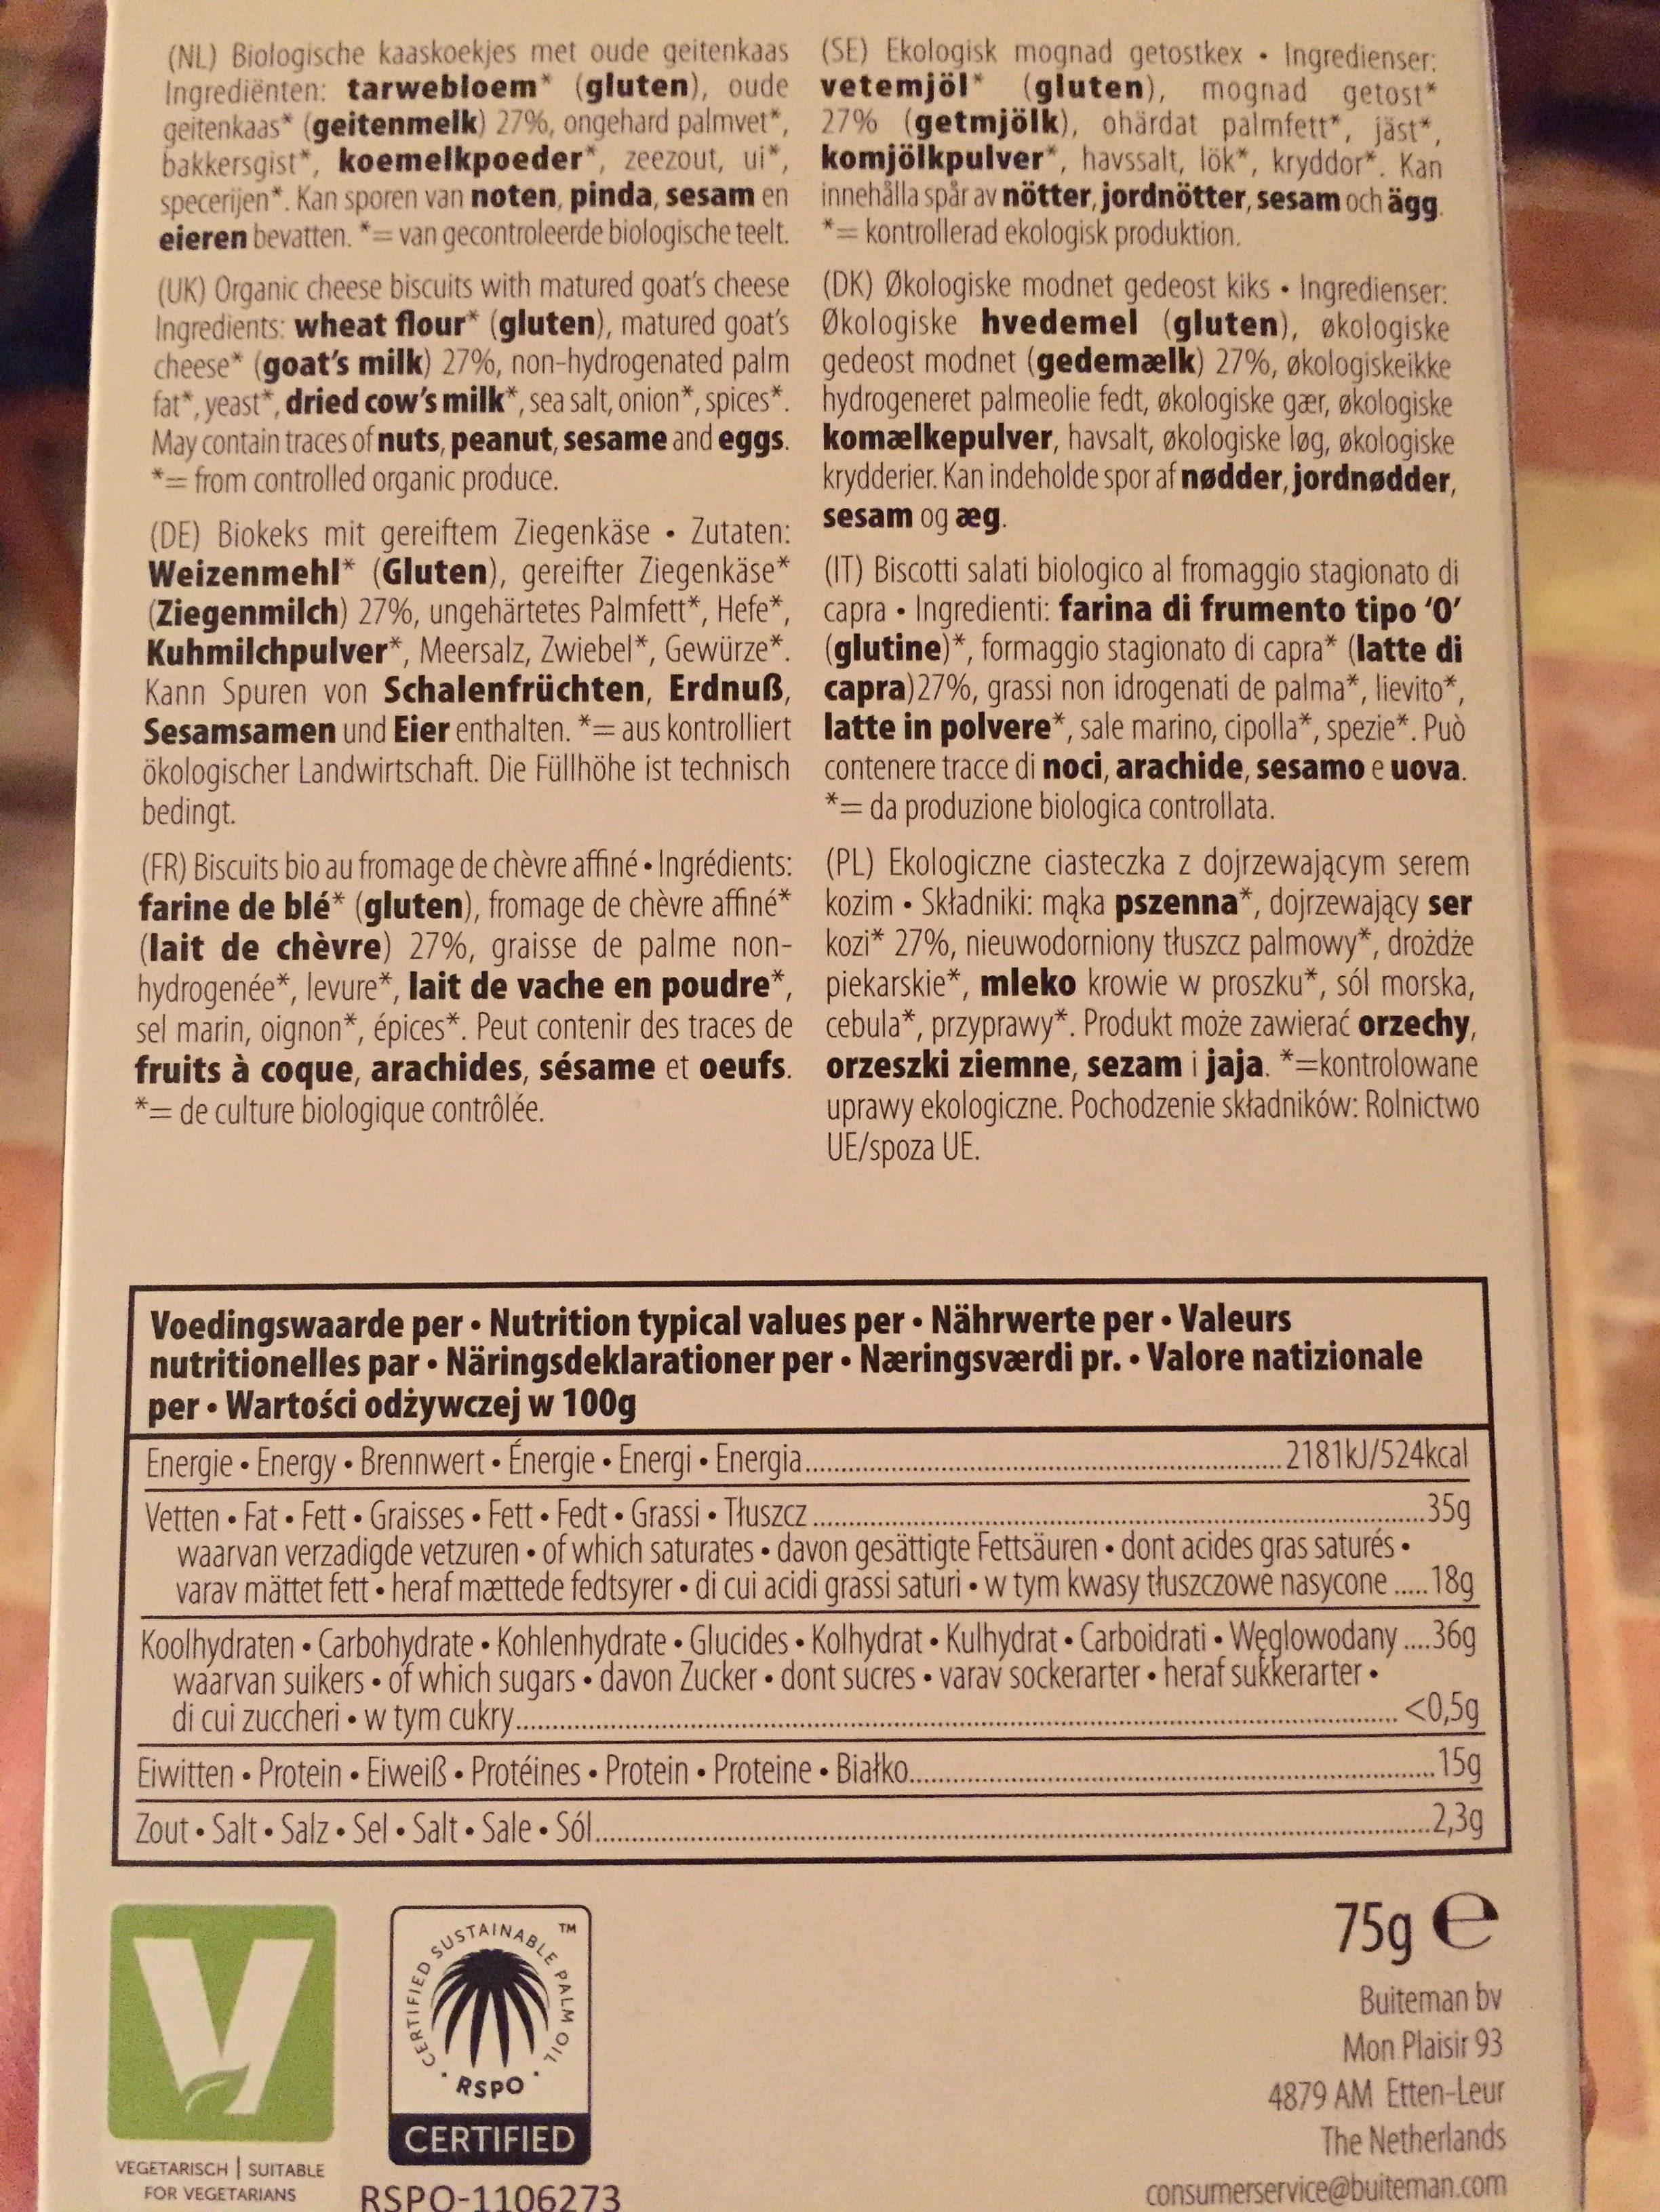 Biscuit Aperitif Fromage Chevre - Ingredients - fr